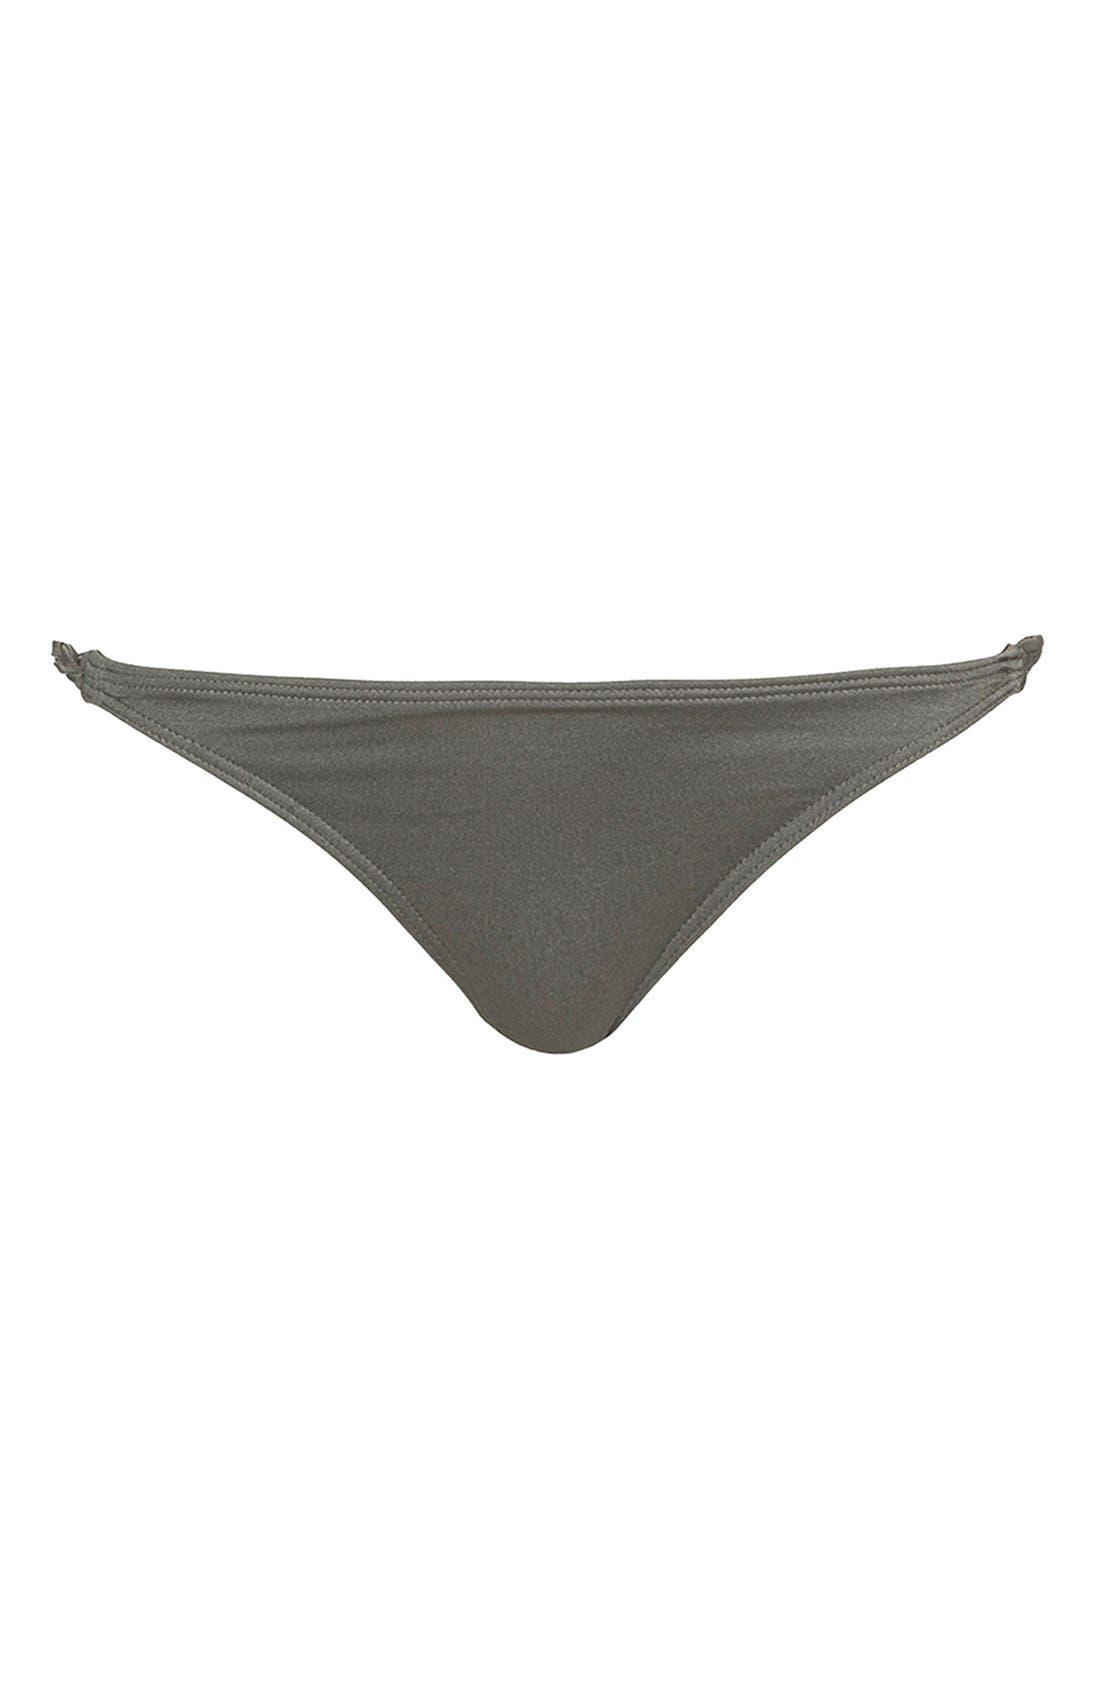 Alternate Image 1 Selected - Topshop 'Sophis' Bikini Bottoms